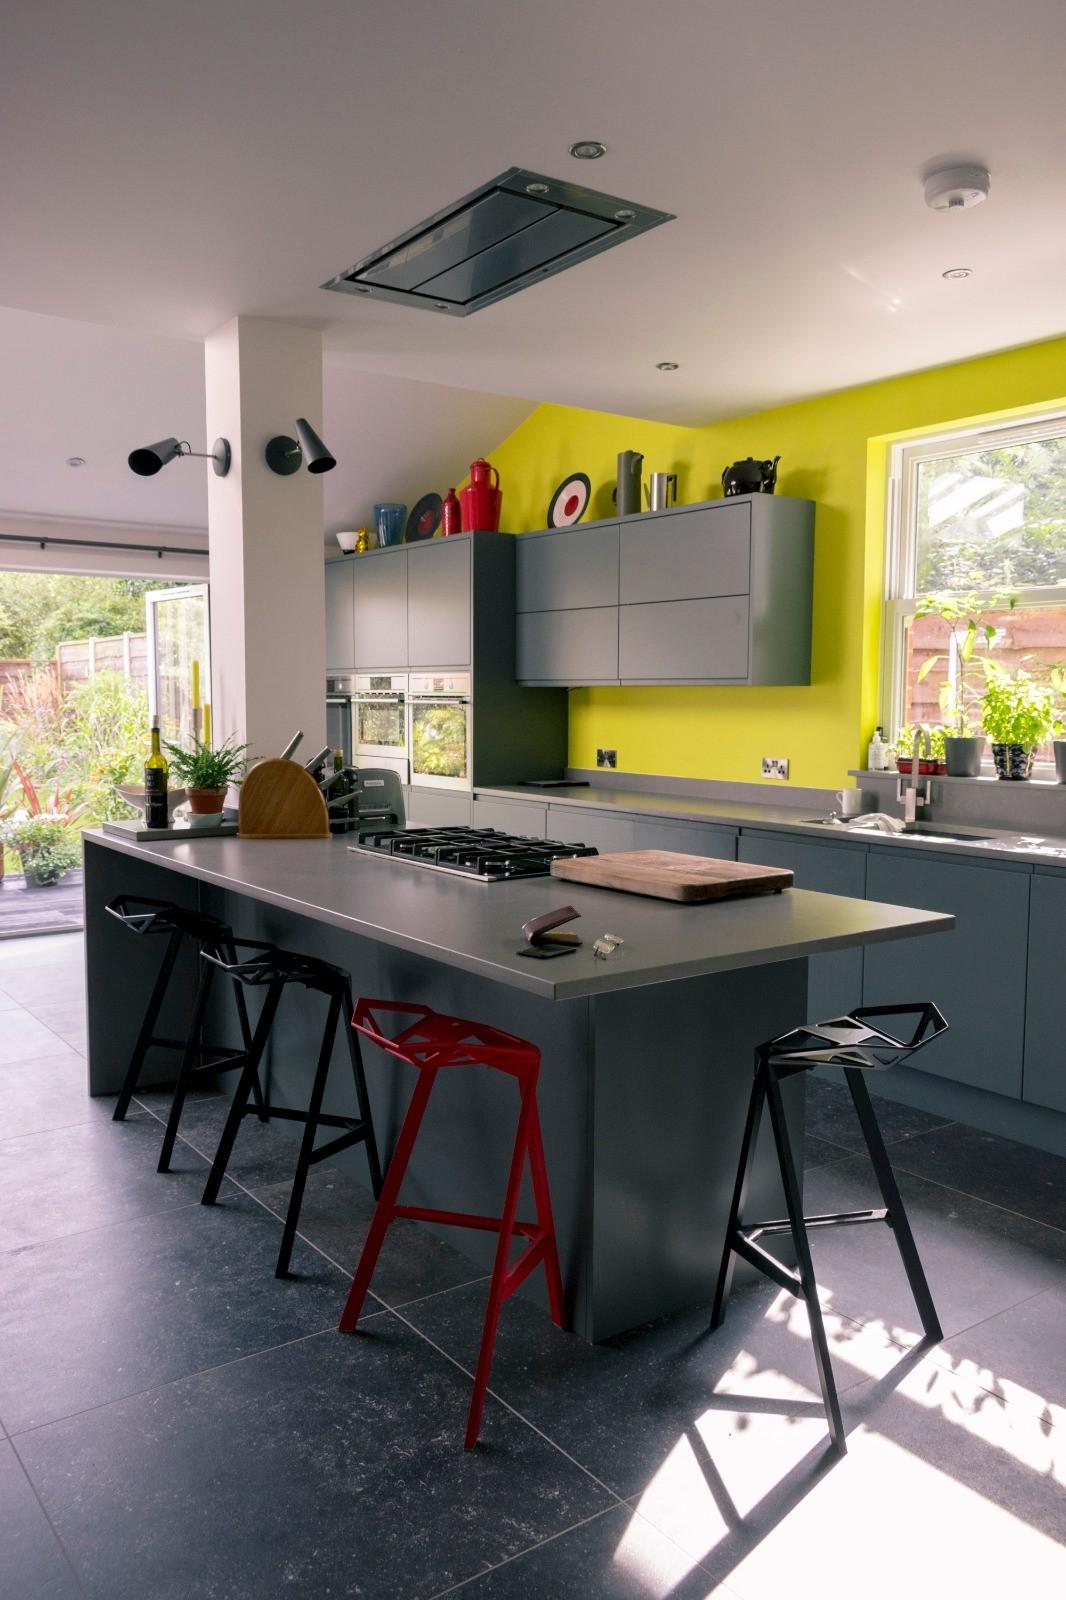 Harveys kitchen